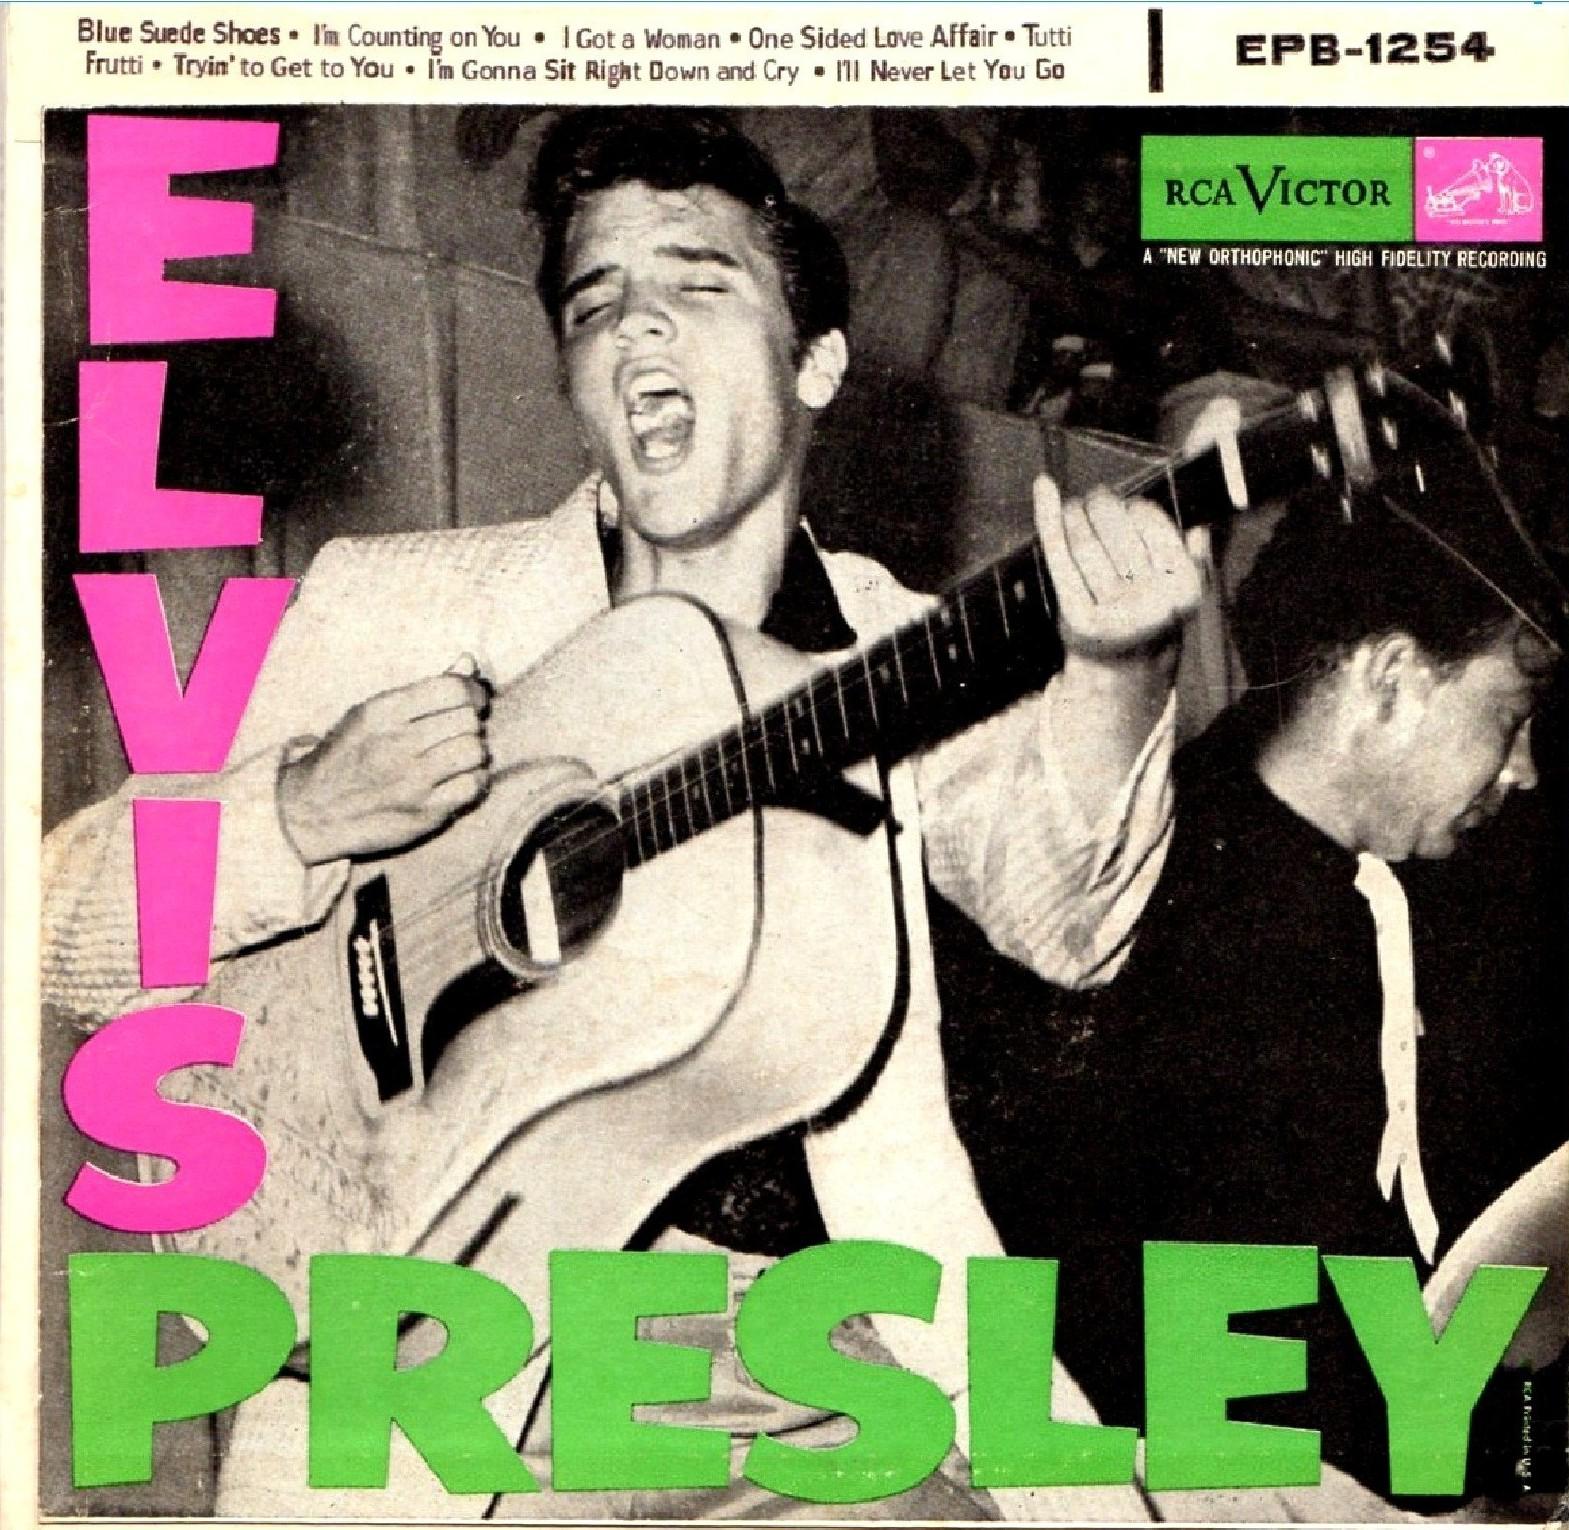 Presley - ELVIS PRESLEY Epb-1254a1bywr